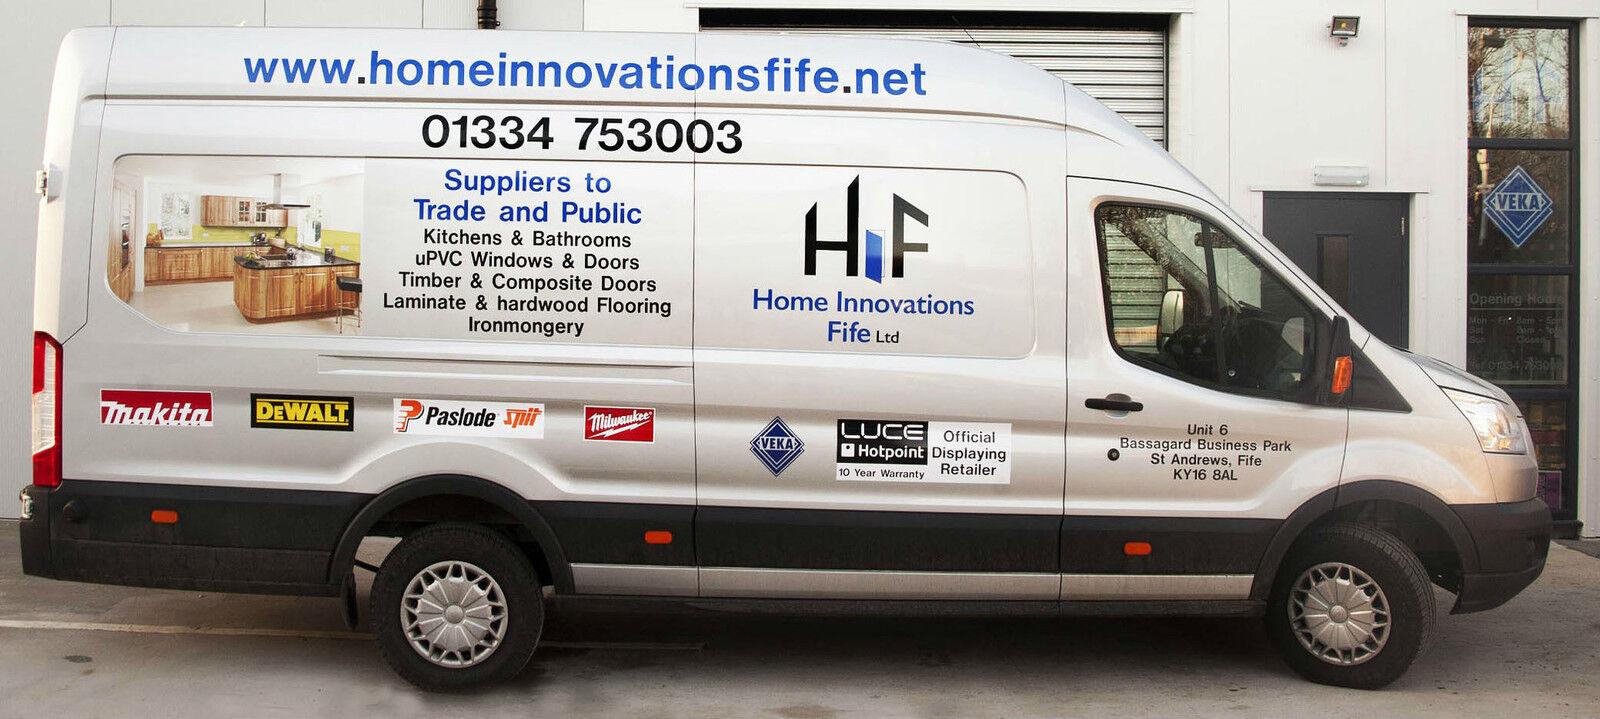 Home Innovations Fife Ltd